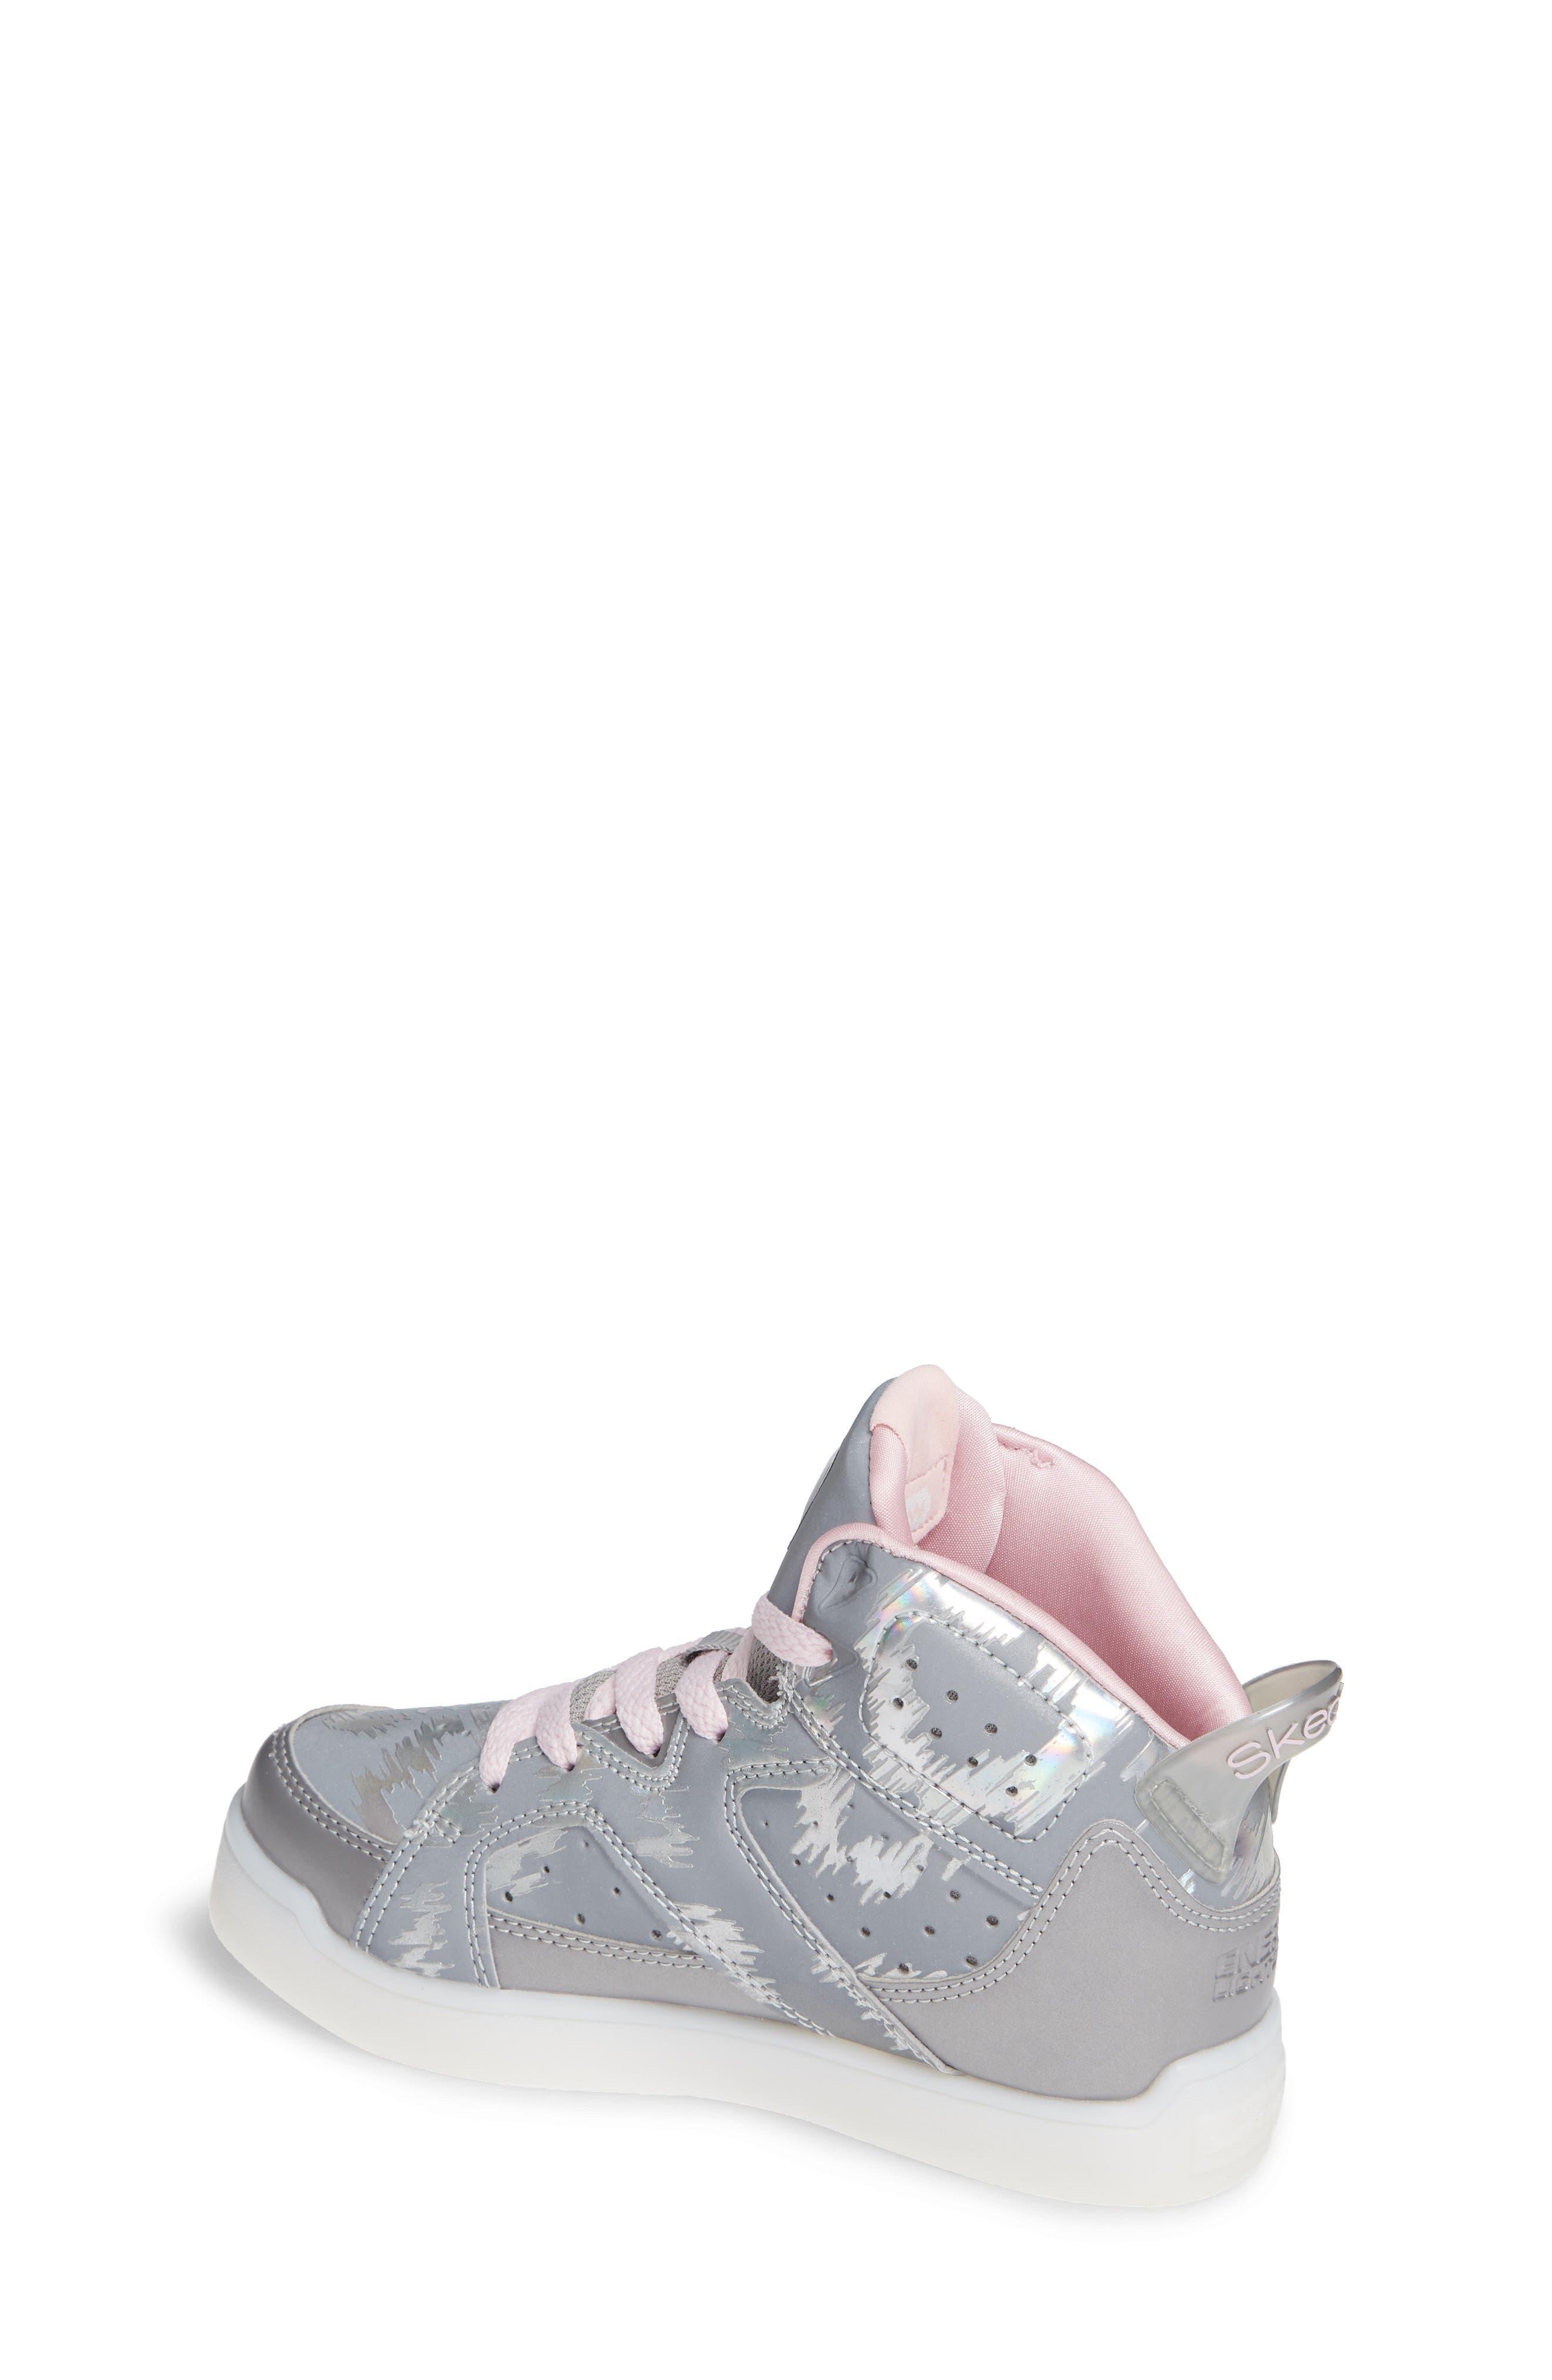 Energy Lights Pro Reflecti-Fab Sneaker,                             Alternate thumbnail 2, color,                             SILVER